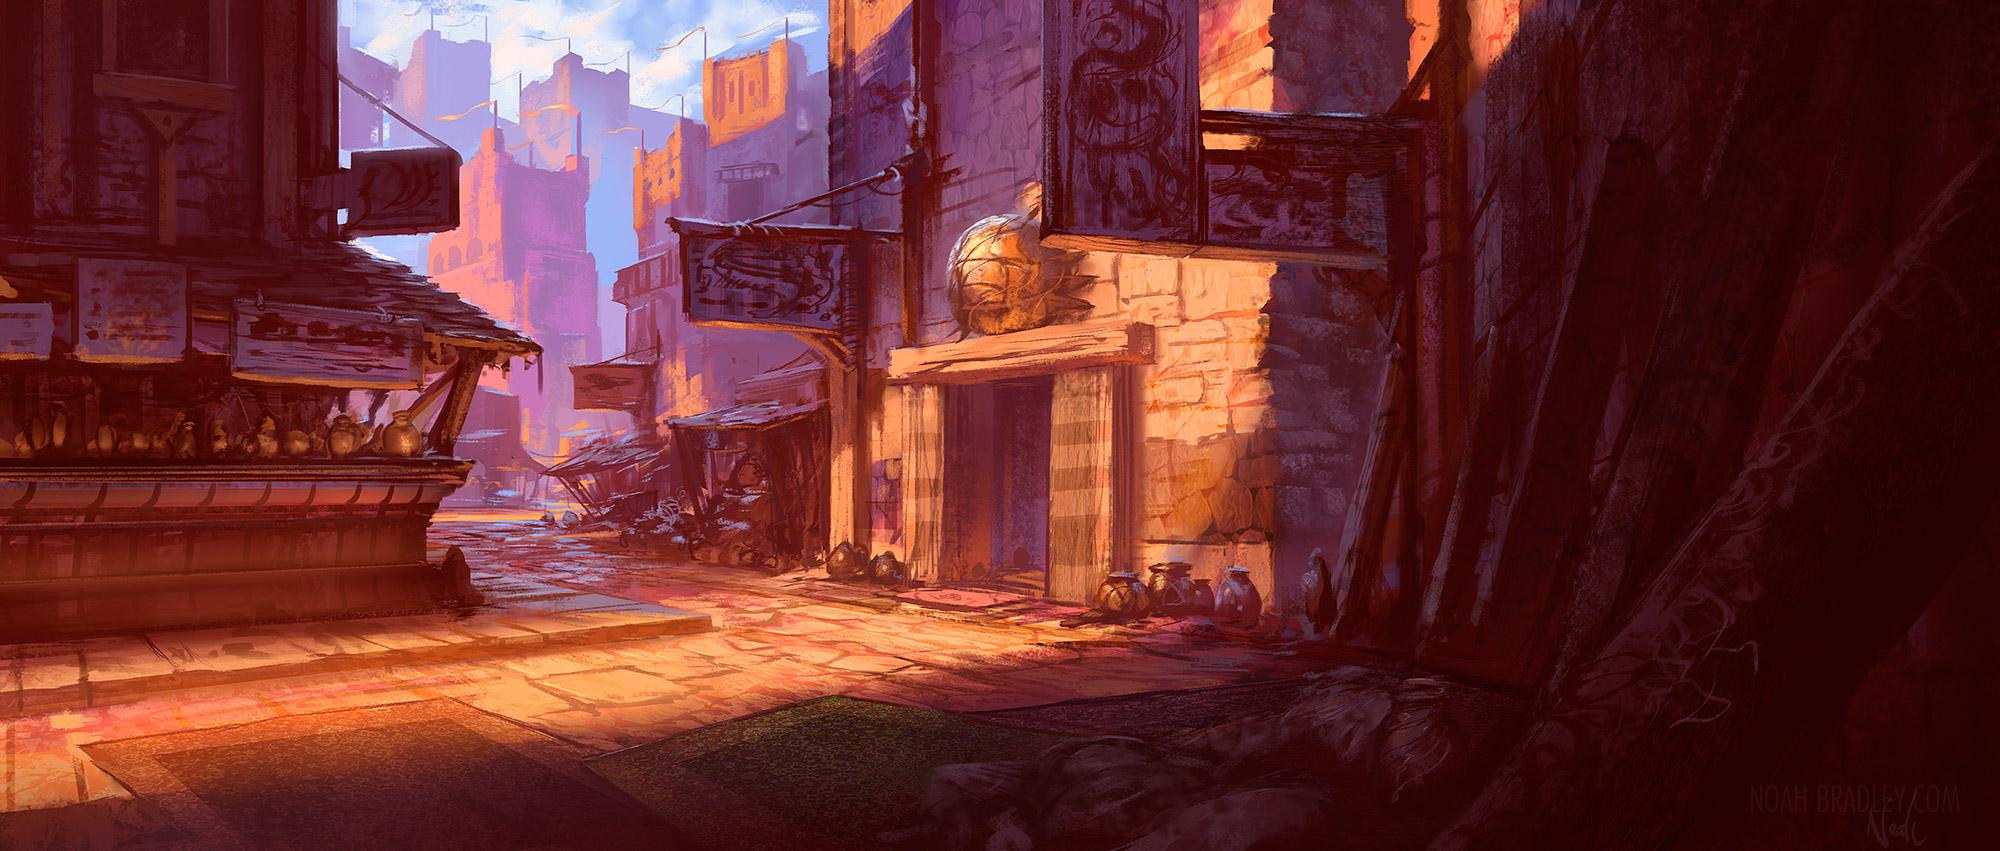 Noah bradley street concept